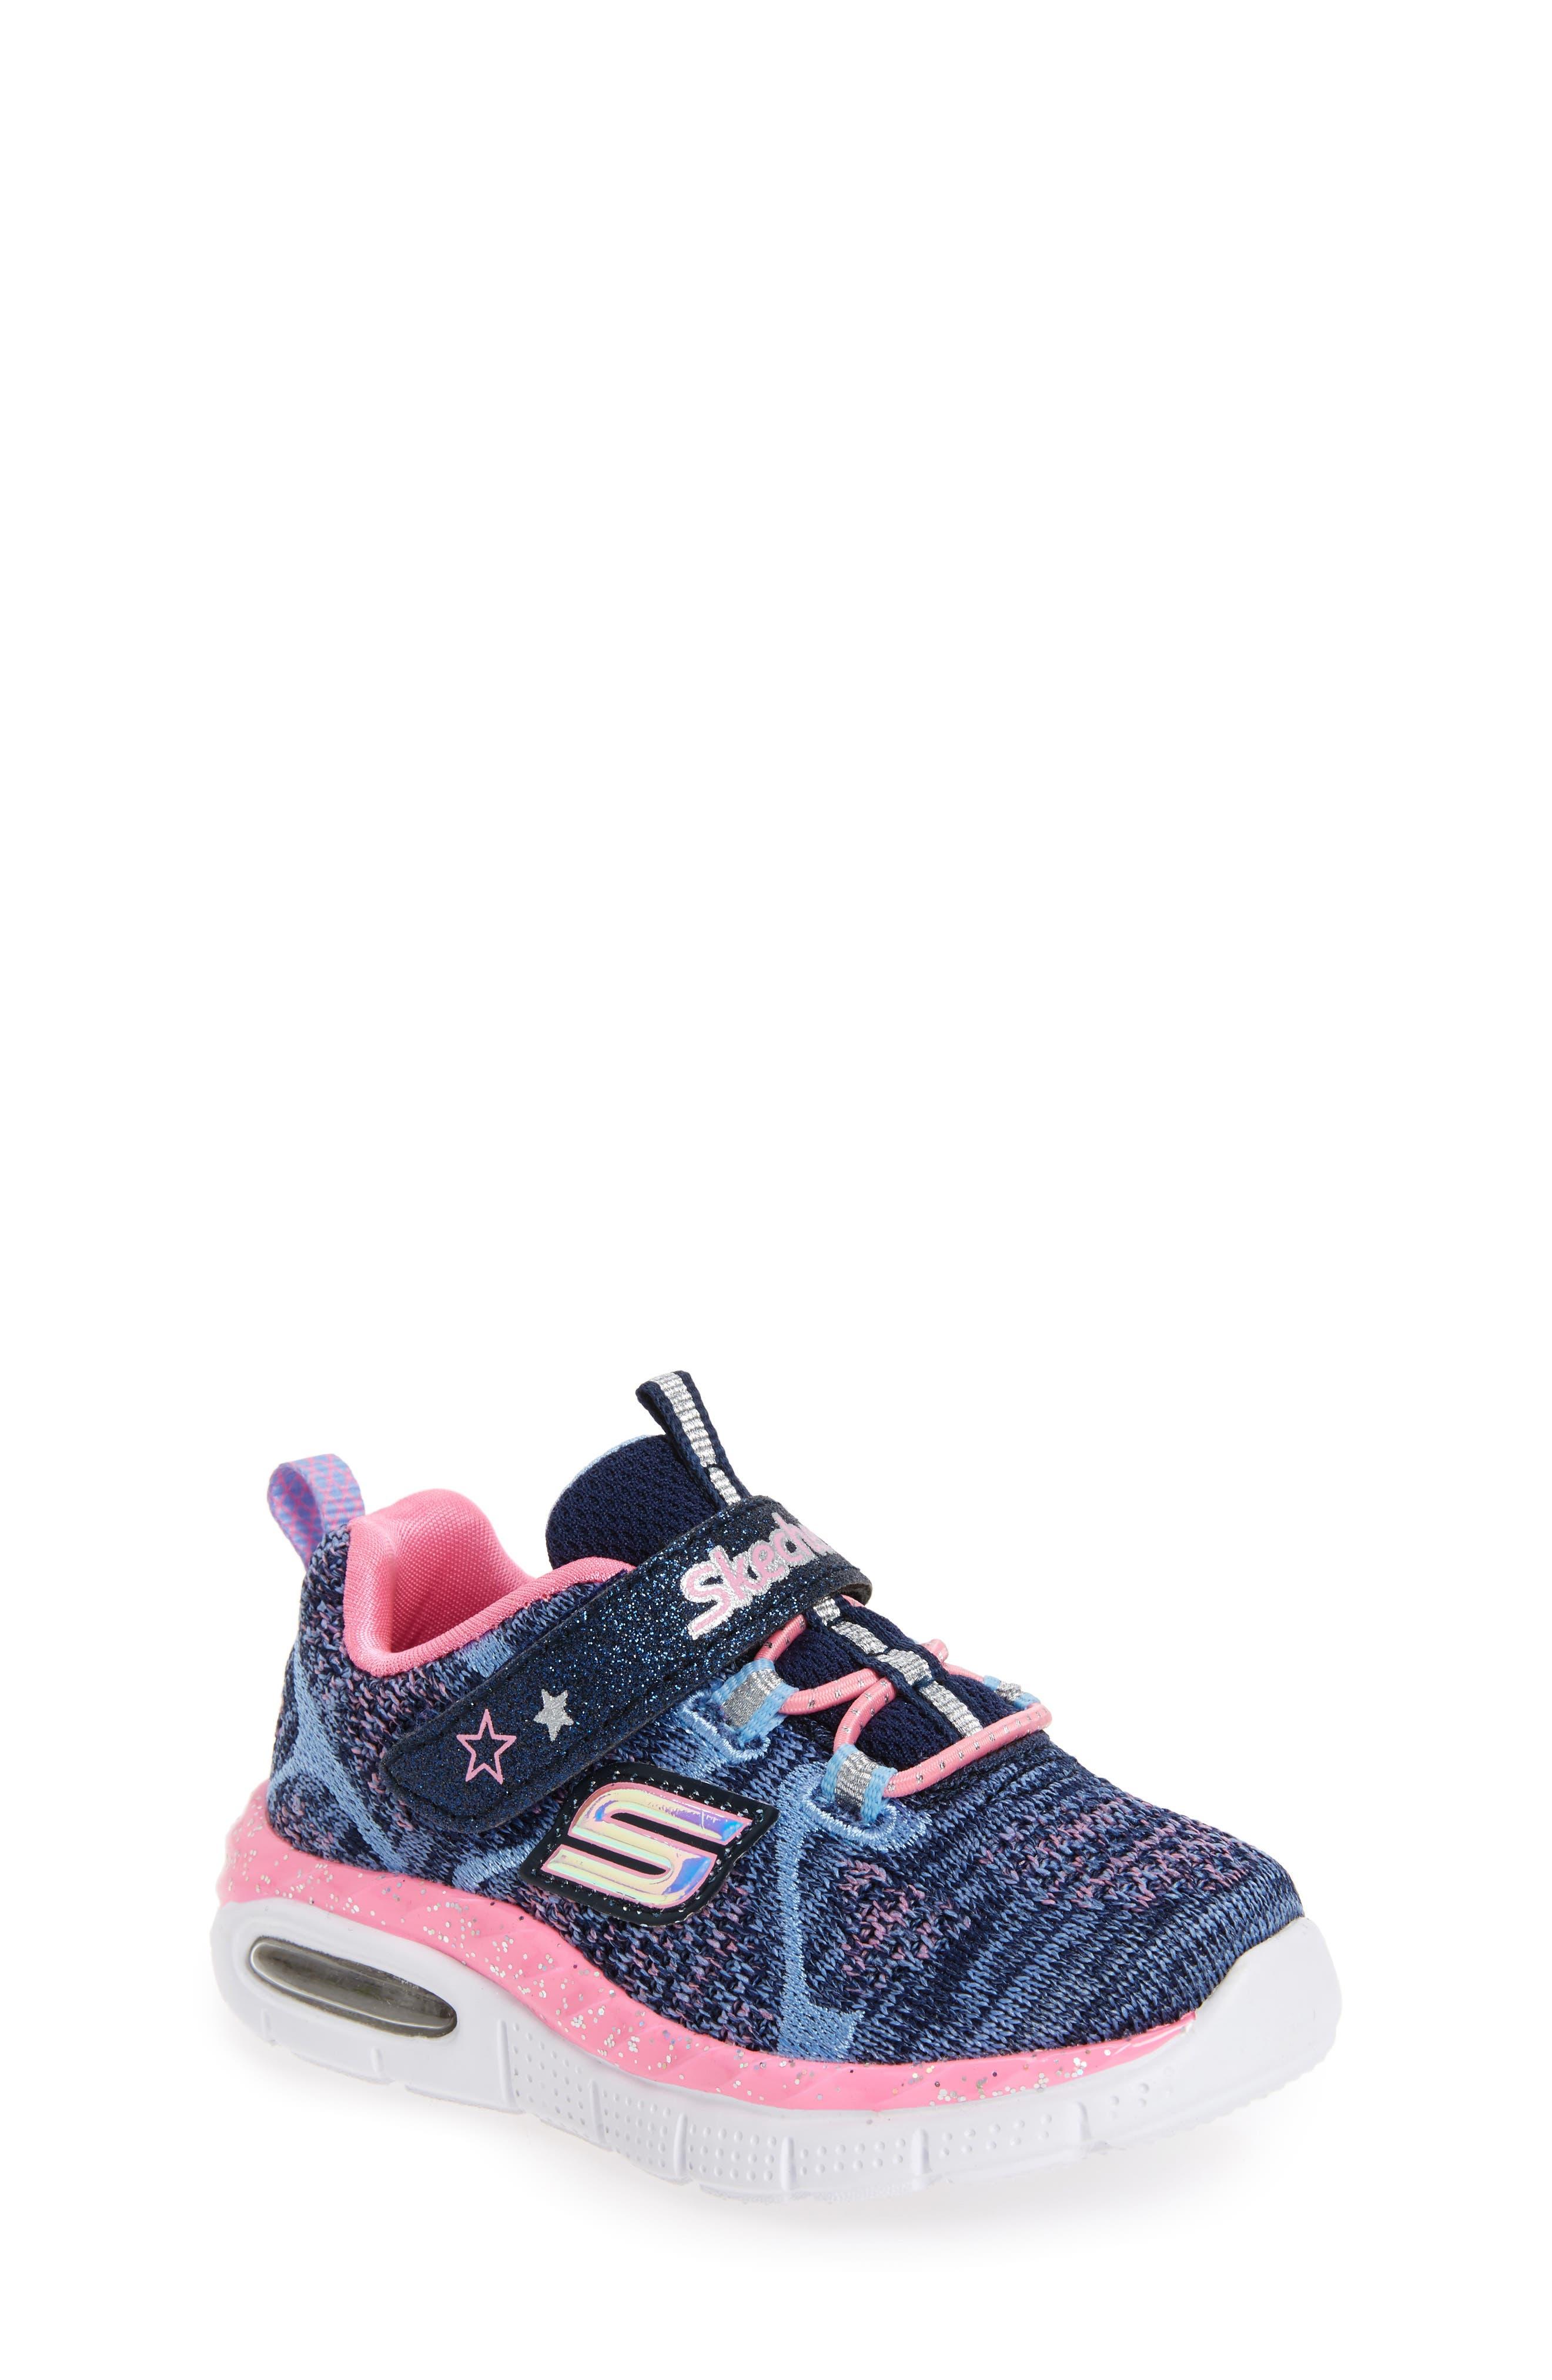 SKECHERS Air Appeal Breezy Baby Sneaker (Toddler & Walker)